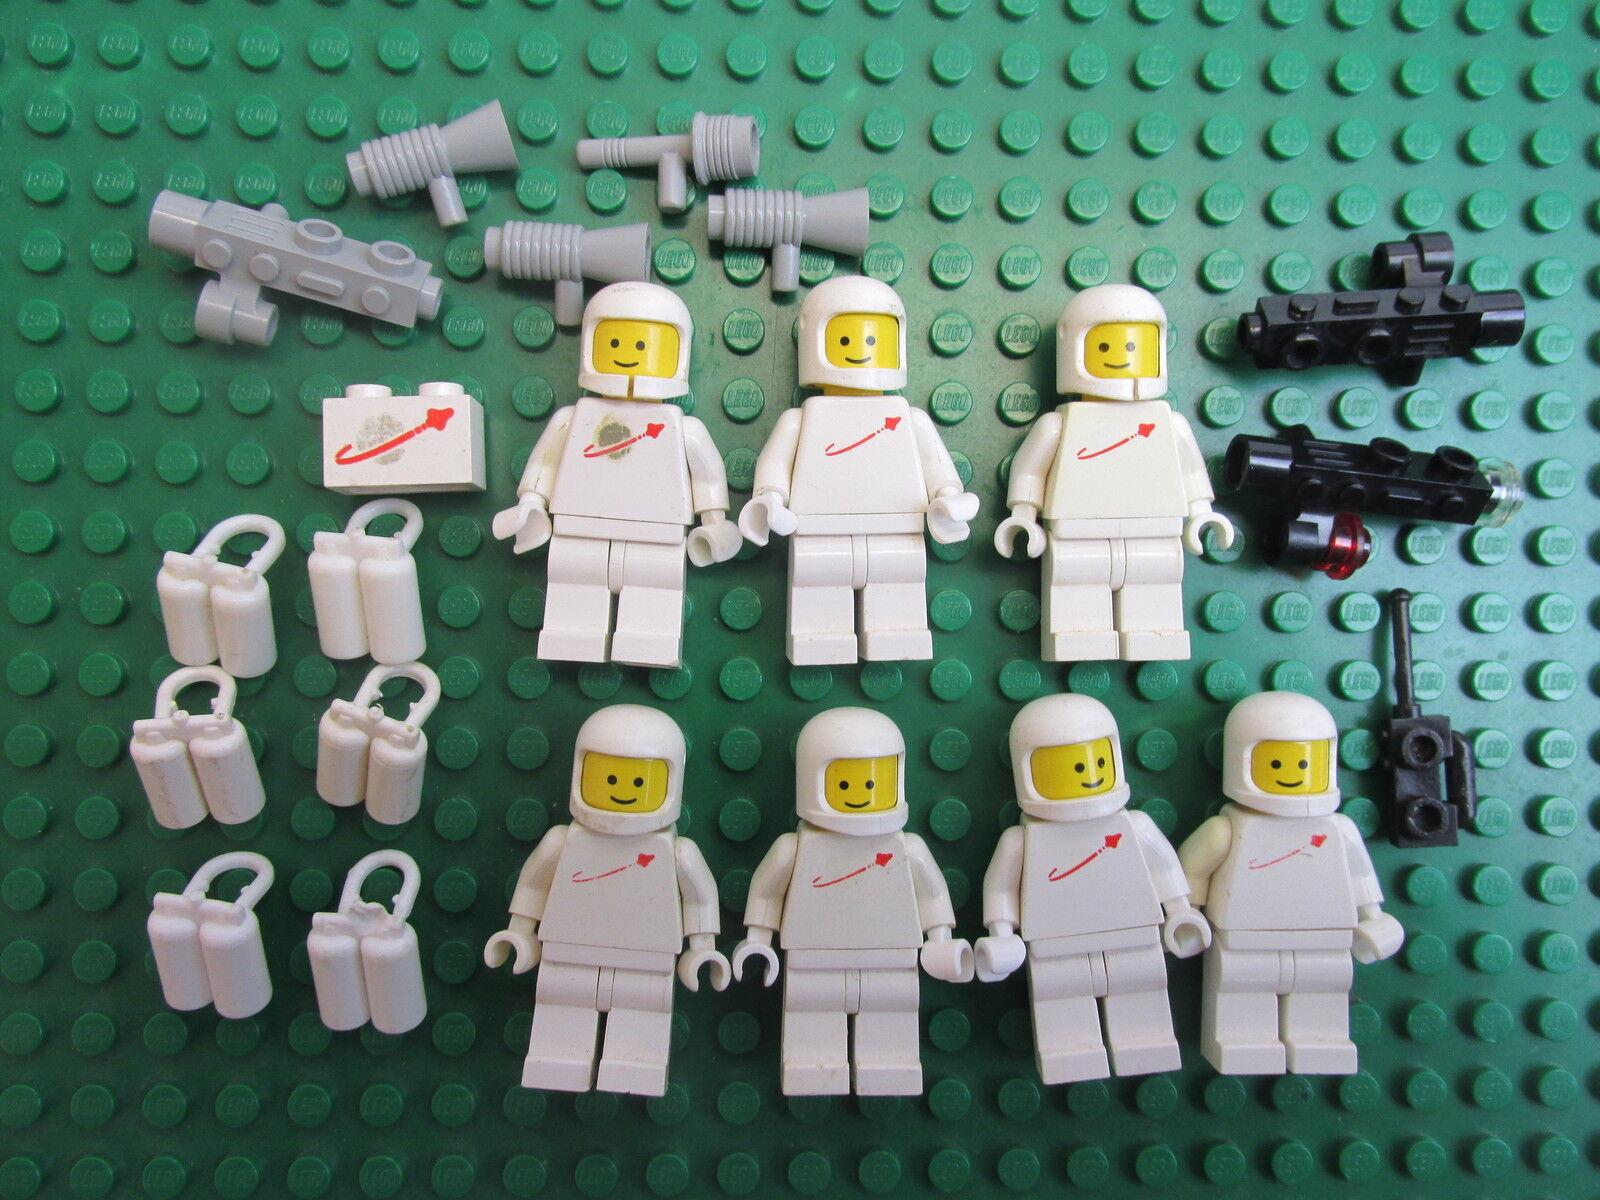 Genuine LEGO vintage SPACEMAN WHITE minifigure RARE RETRO FIGURE LOT SET 277